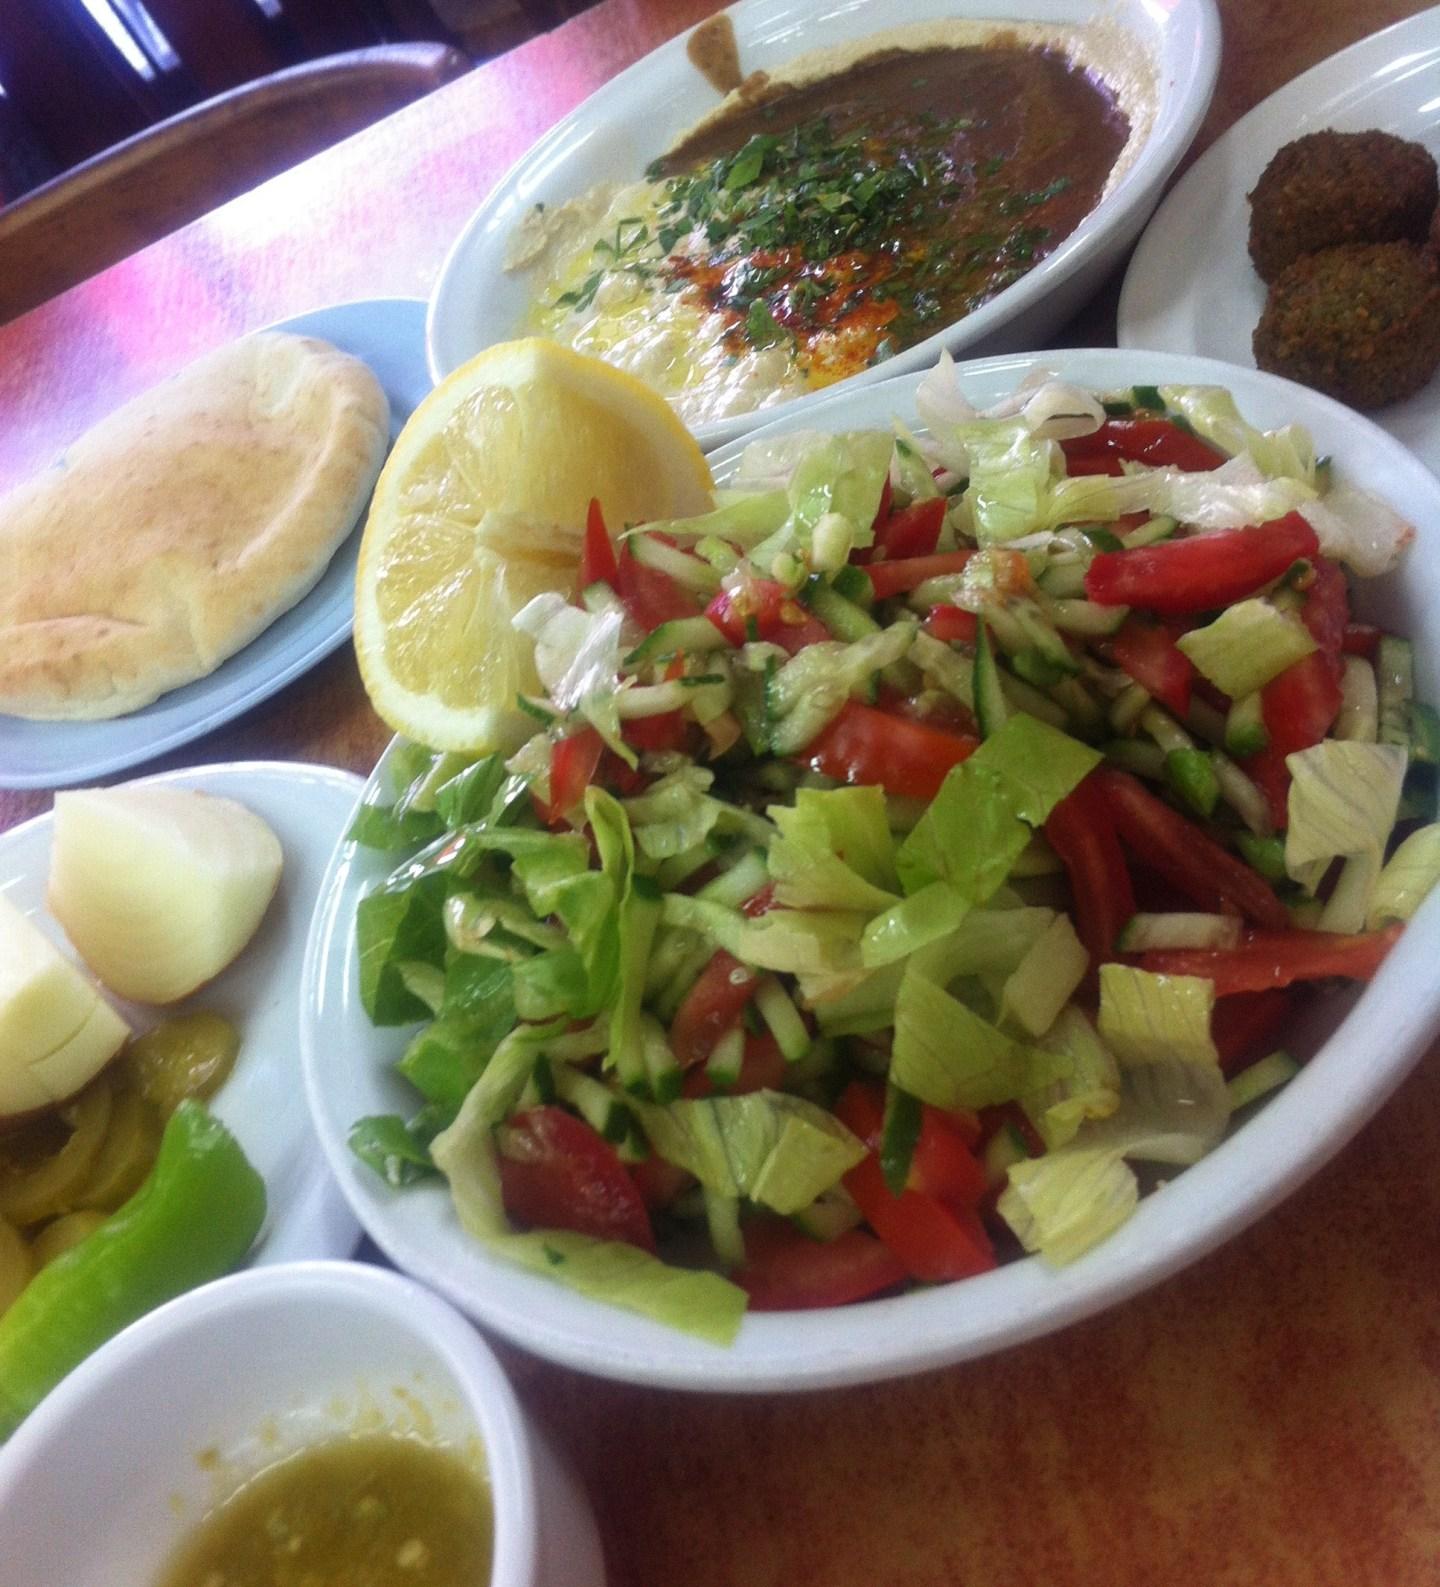 Falafel, salad, pitta, raw onion, chilli sauce and fresh tomato.